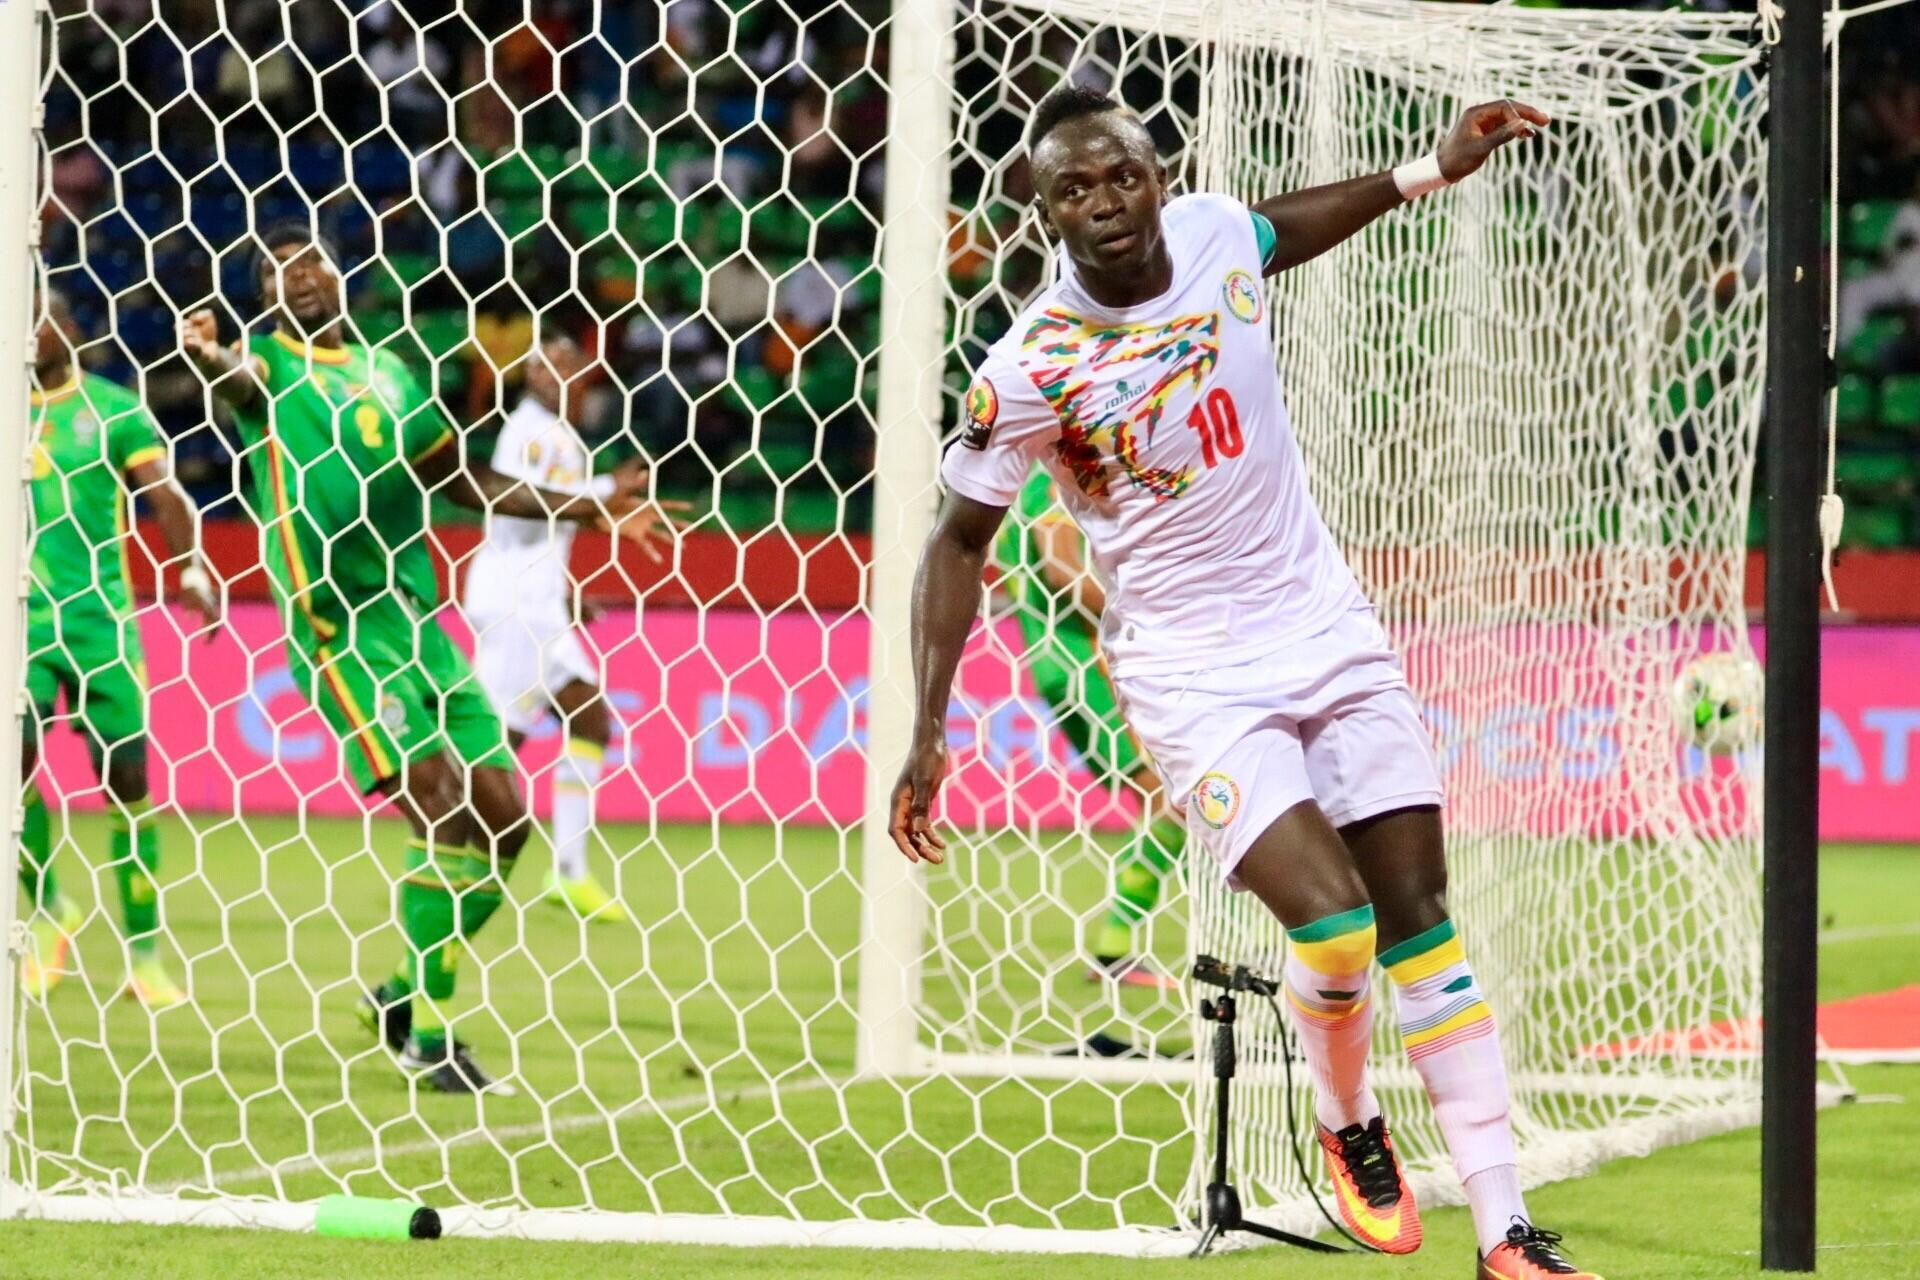 Sadio Mané scored Senegal's first goal against Zimbabwe.